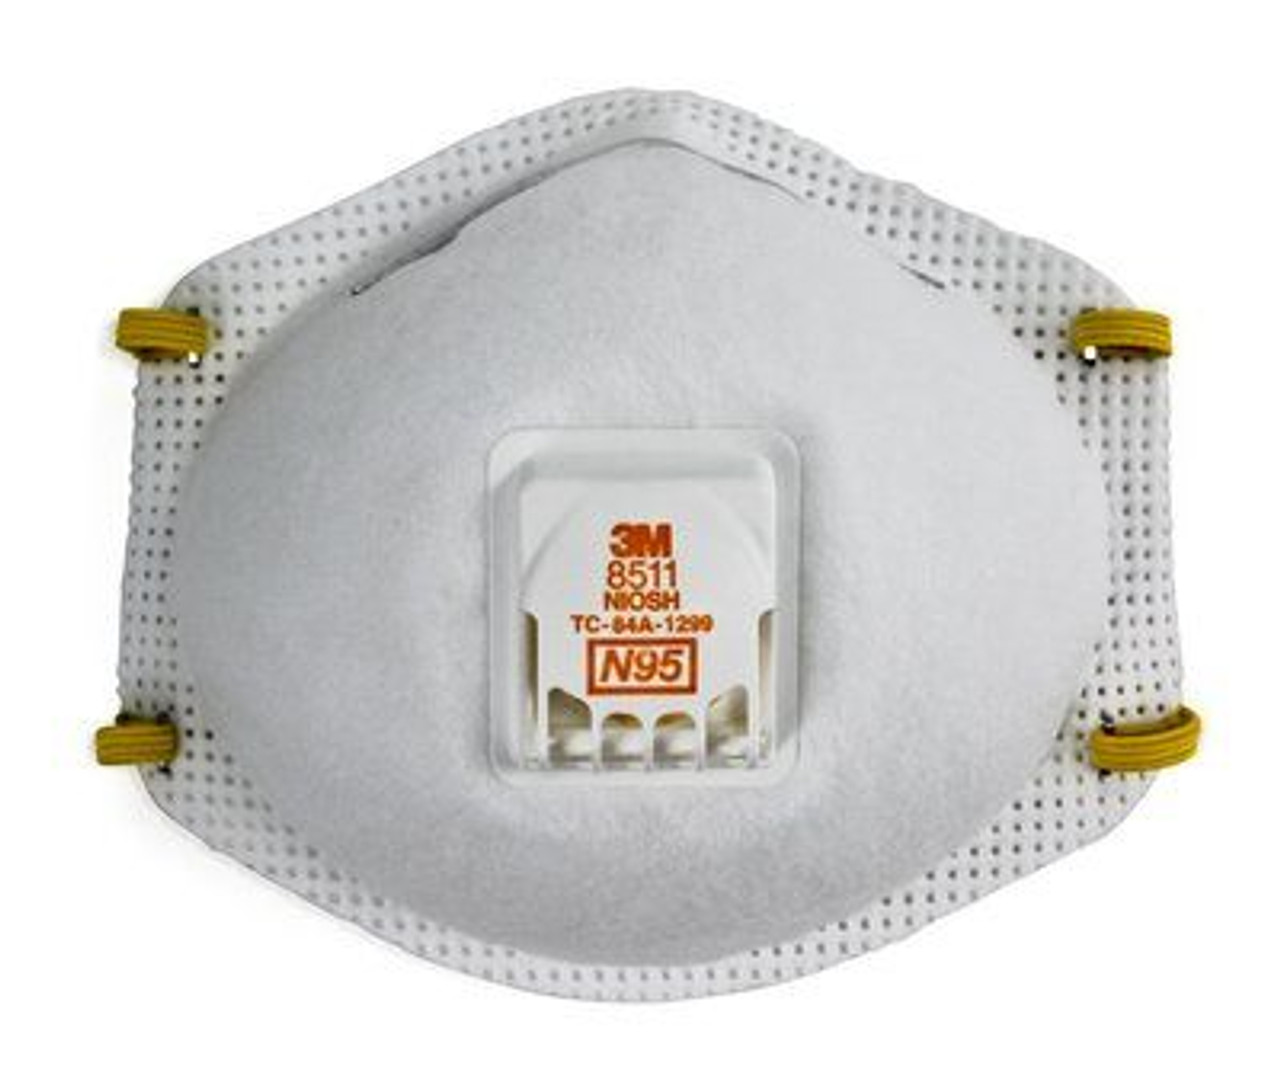 safety works n95 exhalation valve mask